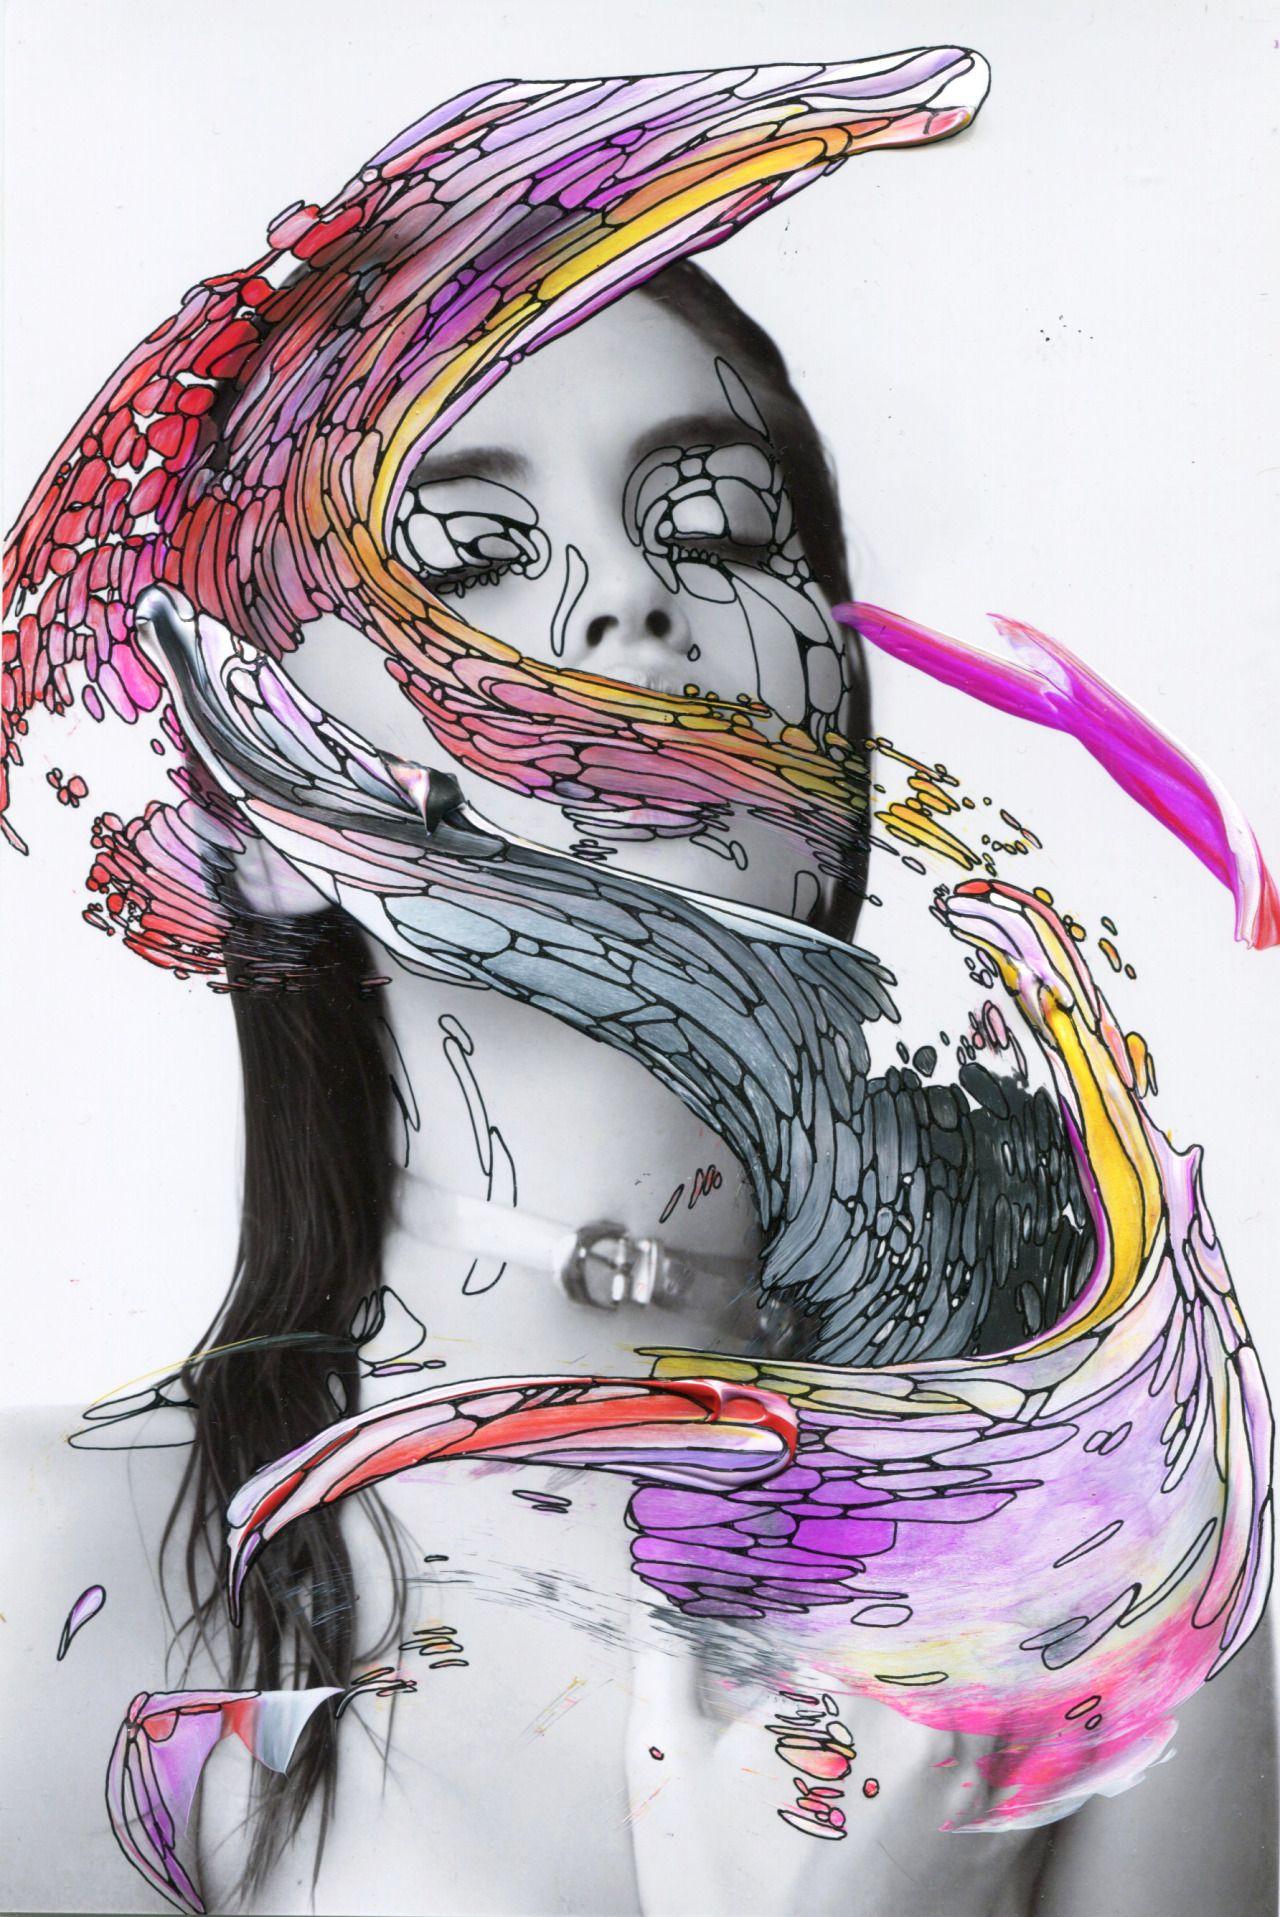 Alana Dee Haynes x Antonella Artismendi Kristina imagine replacing swirl with a swirl of universe